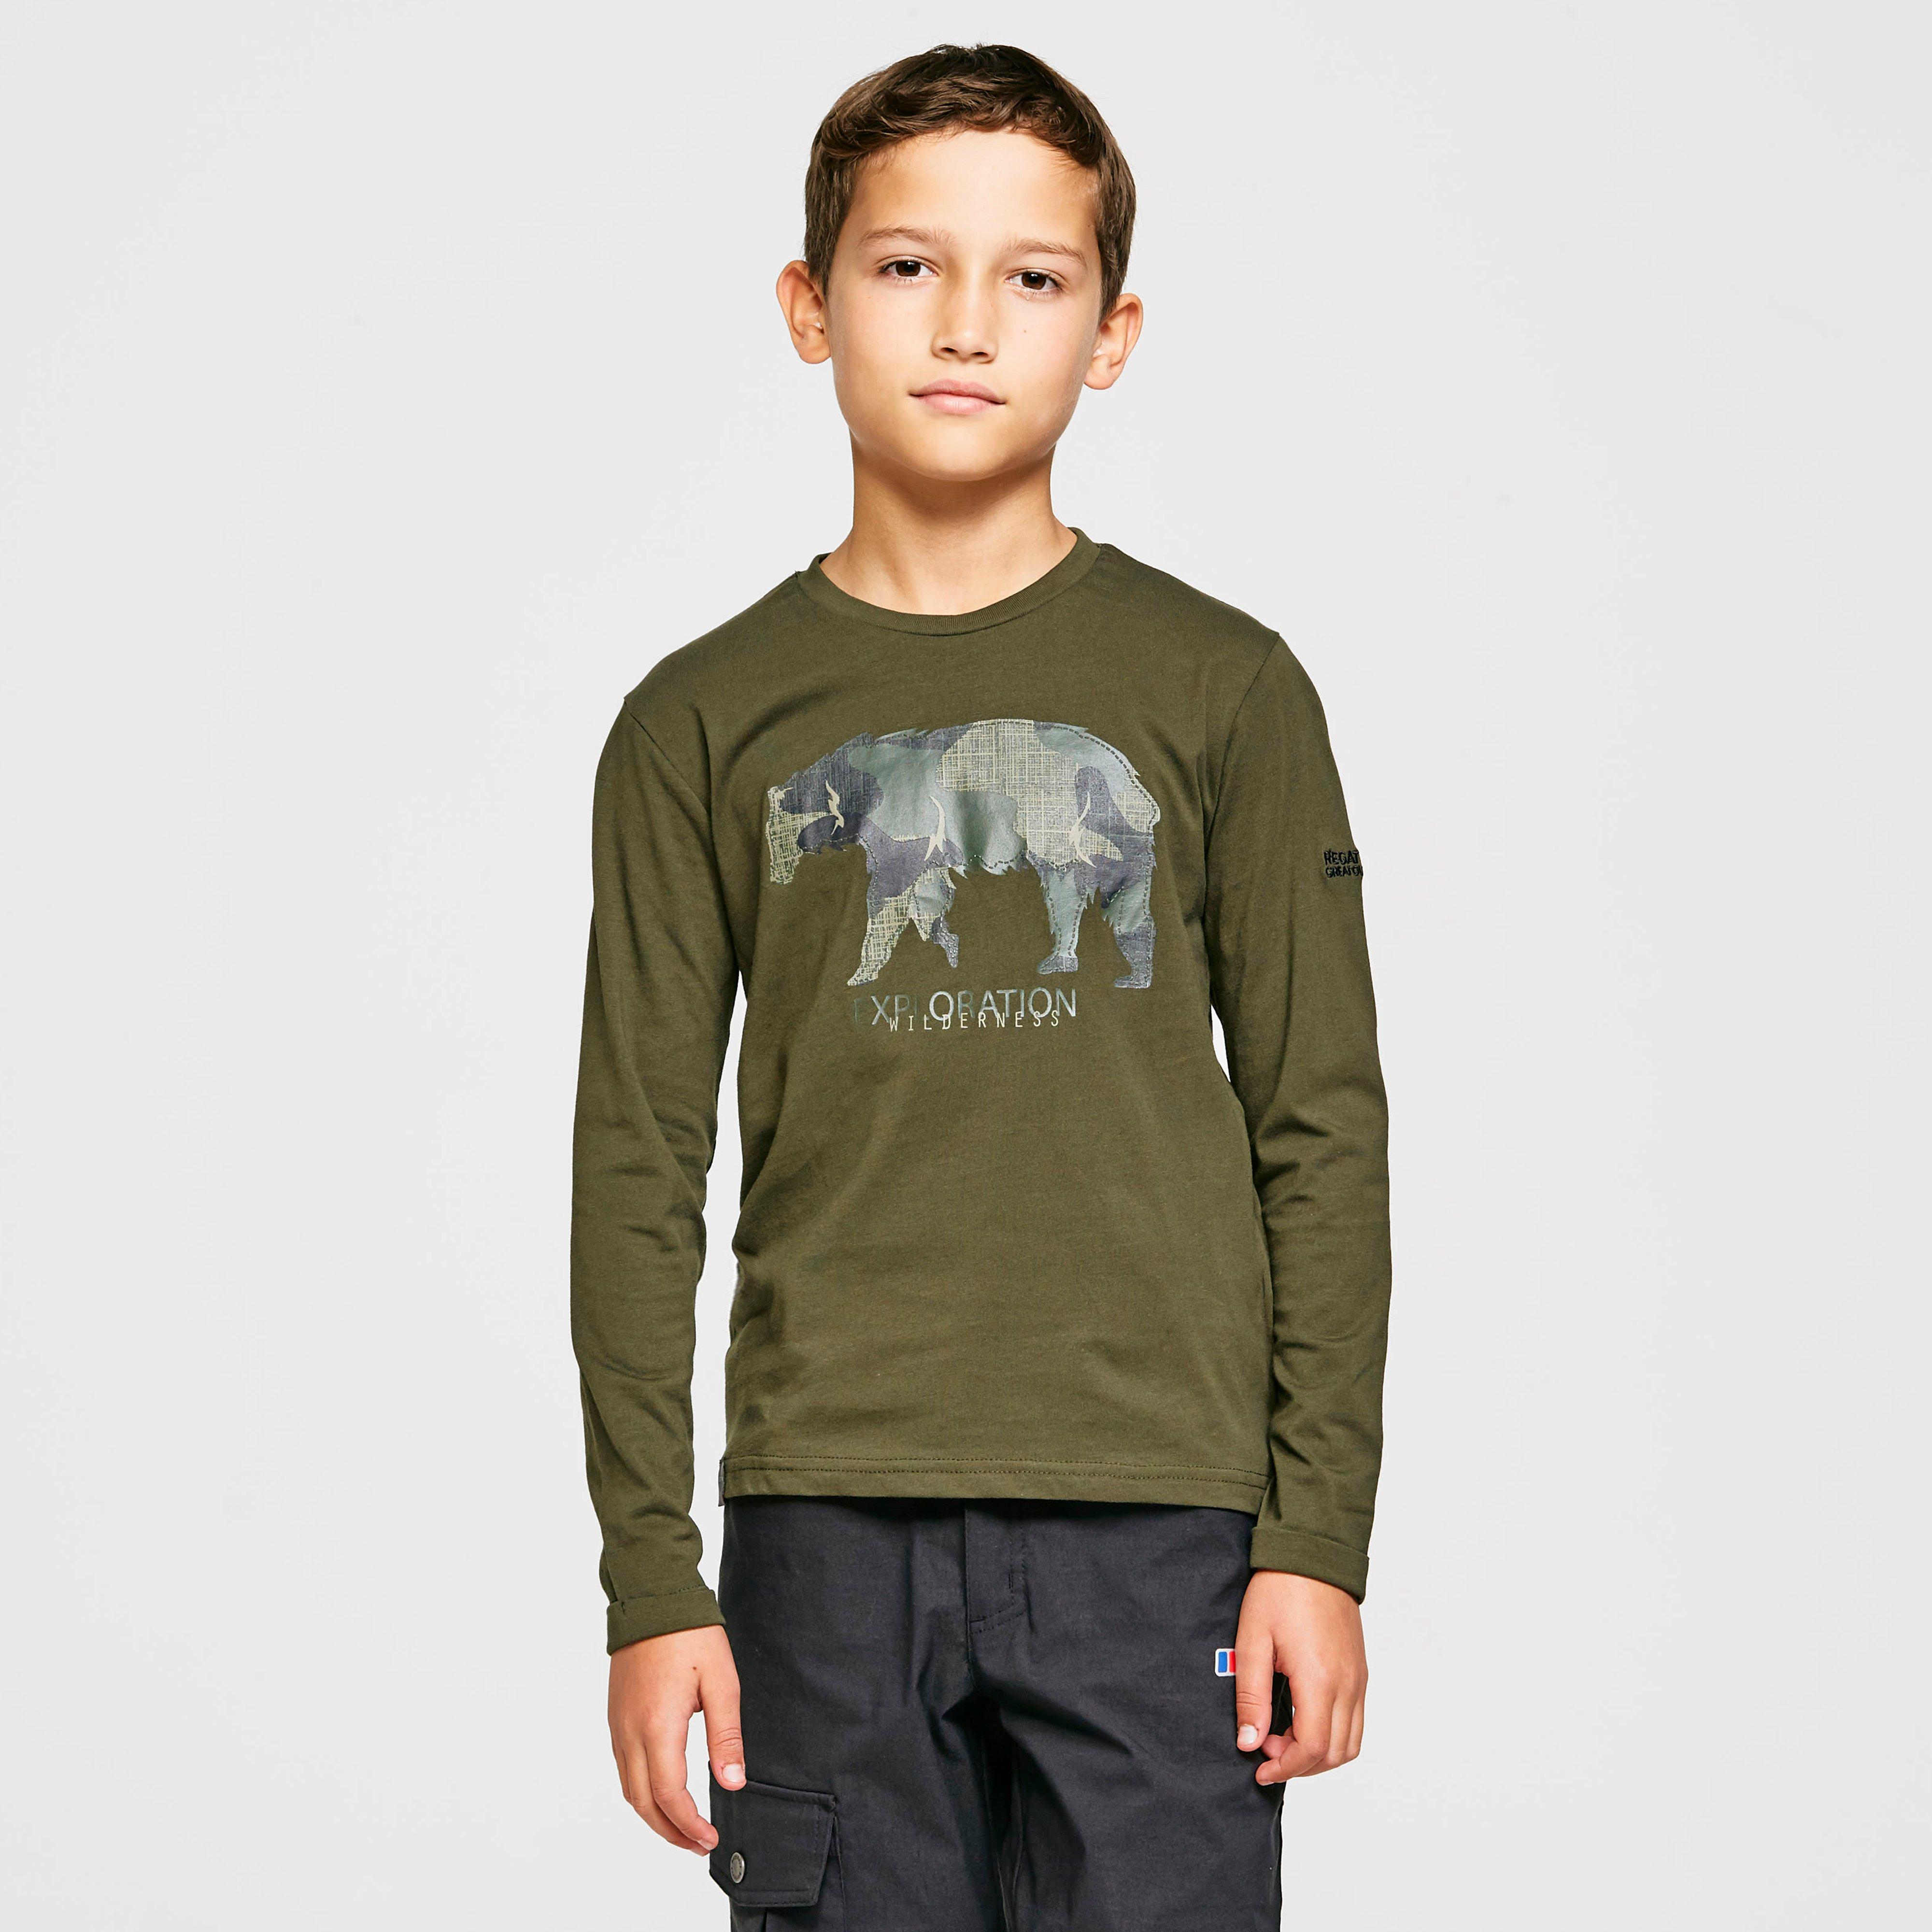 Regatta Kids Wenbie Long-sleeved Top - Khaki/khaki  Khaki/khaki